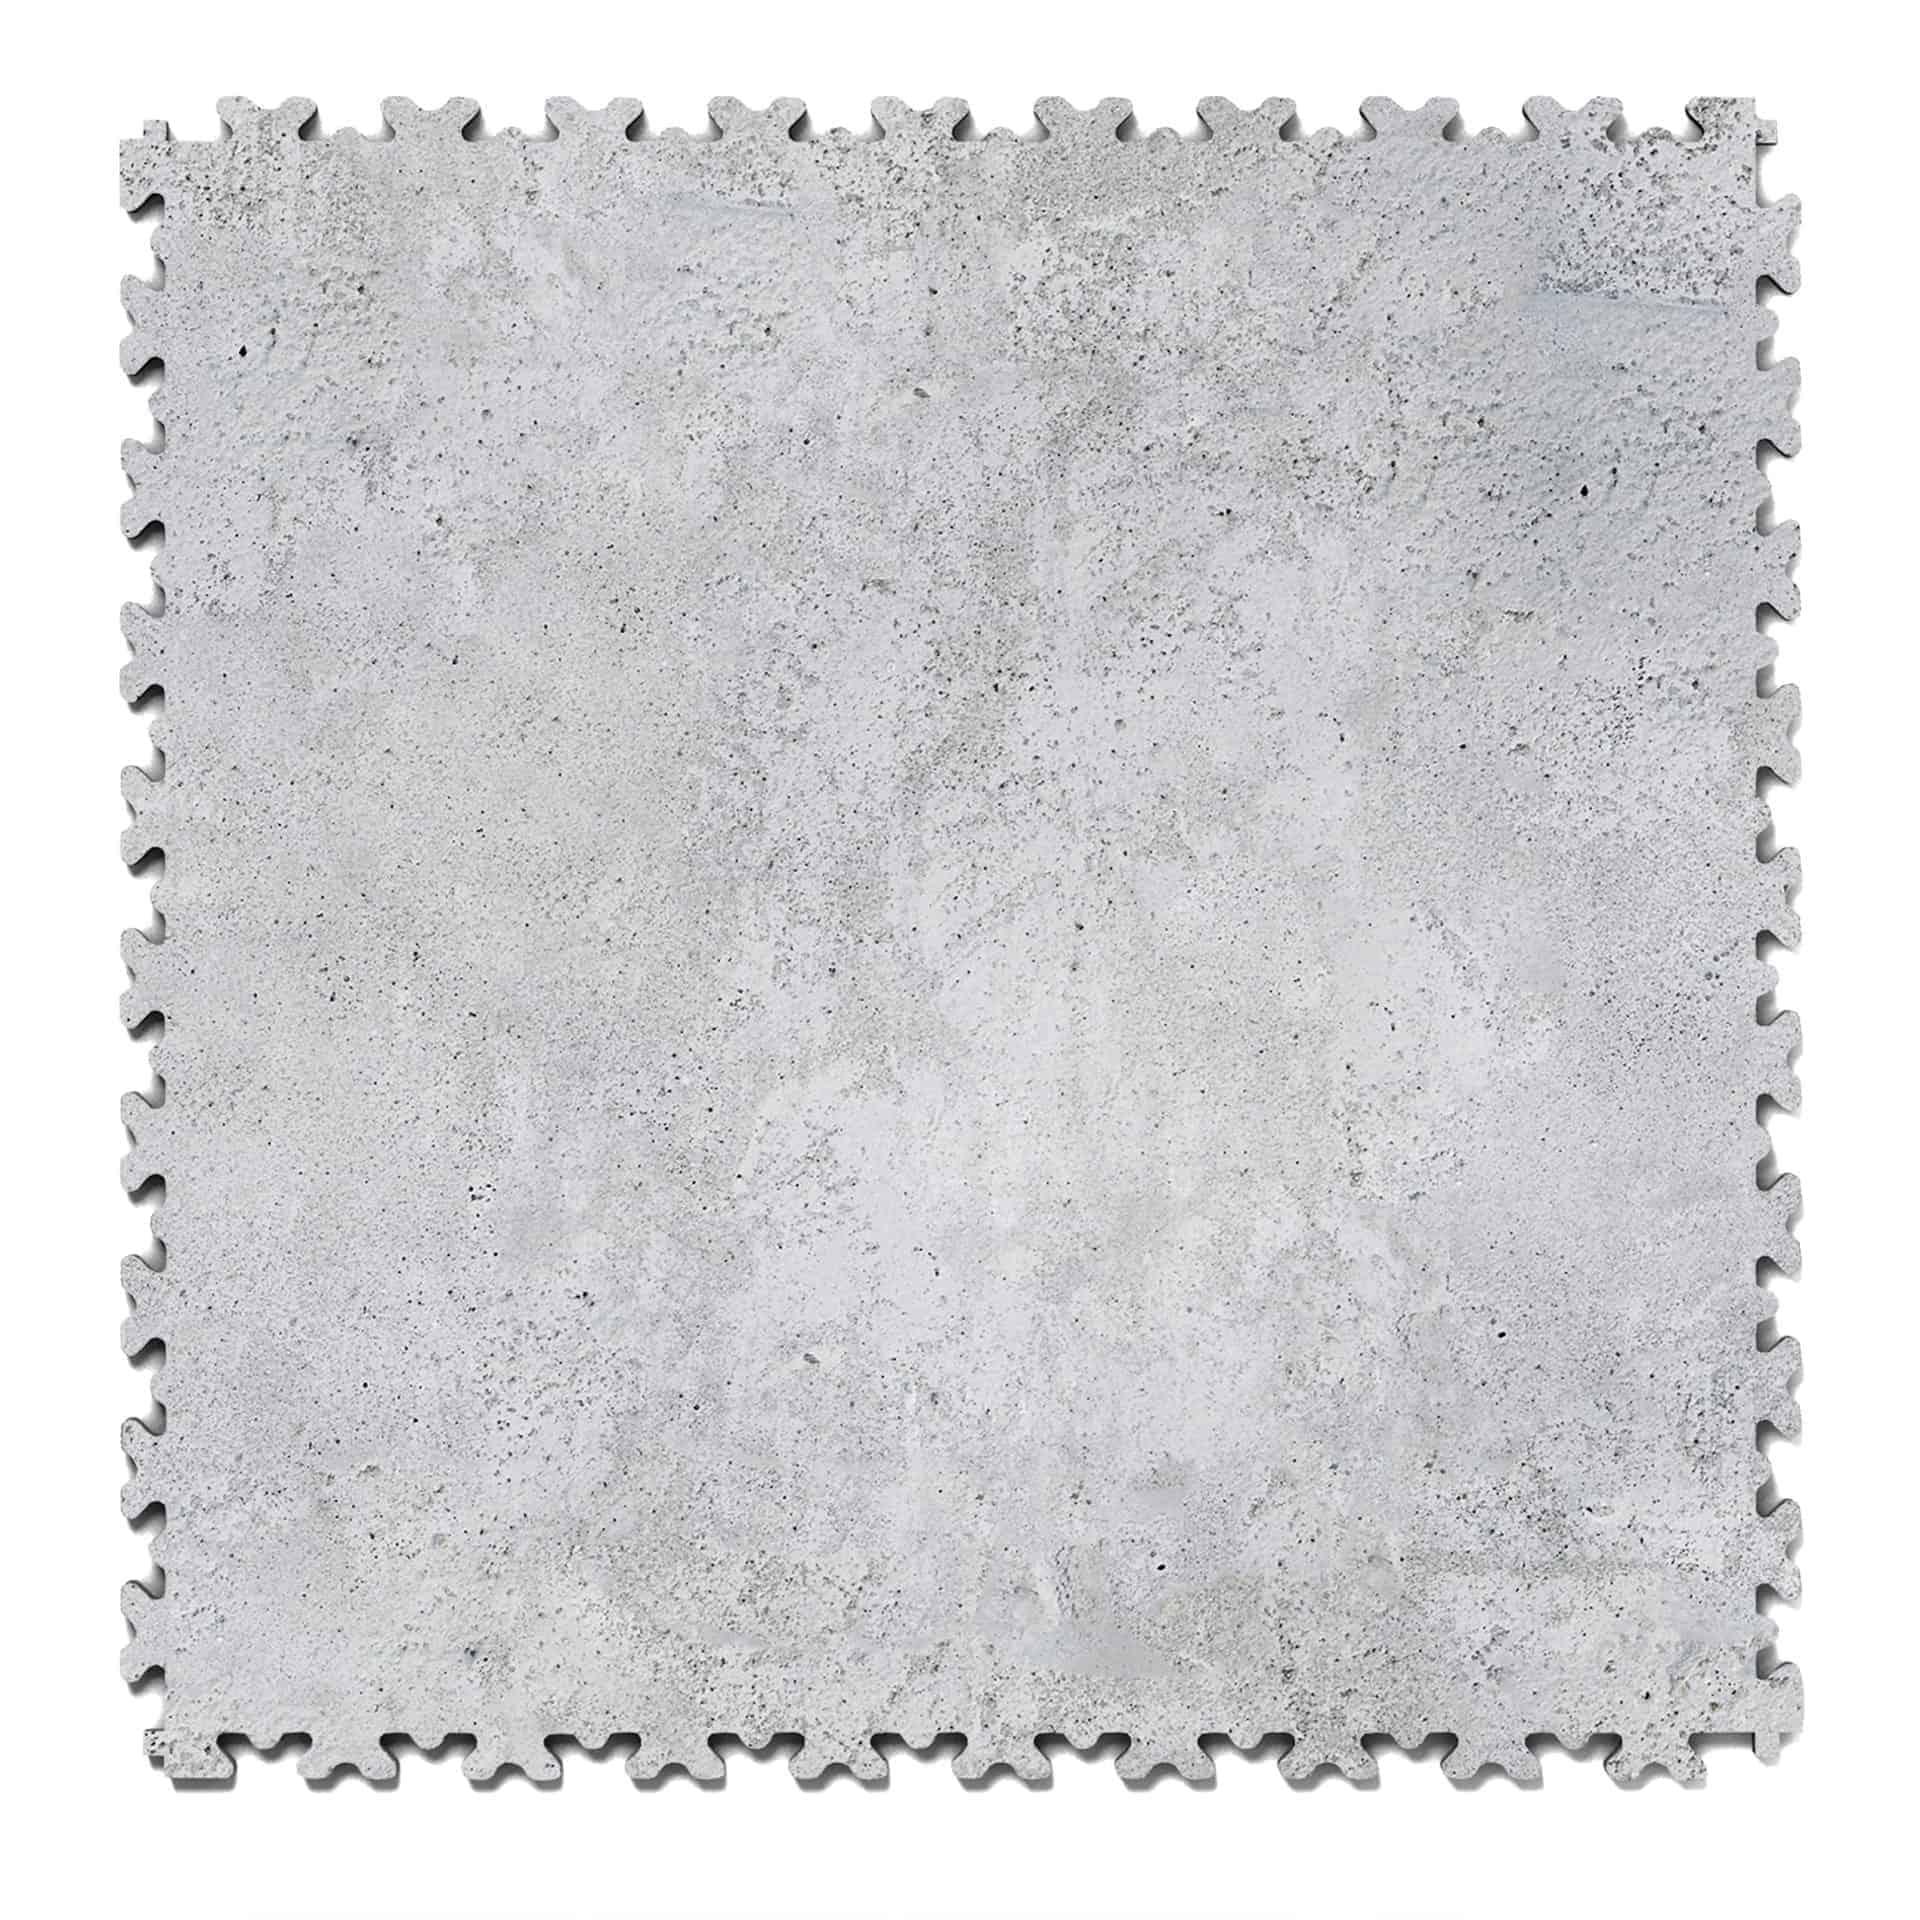 Concrete Light prints